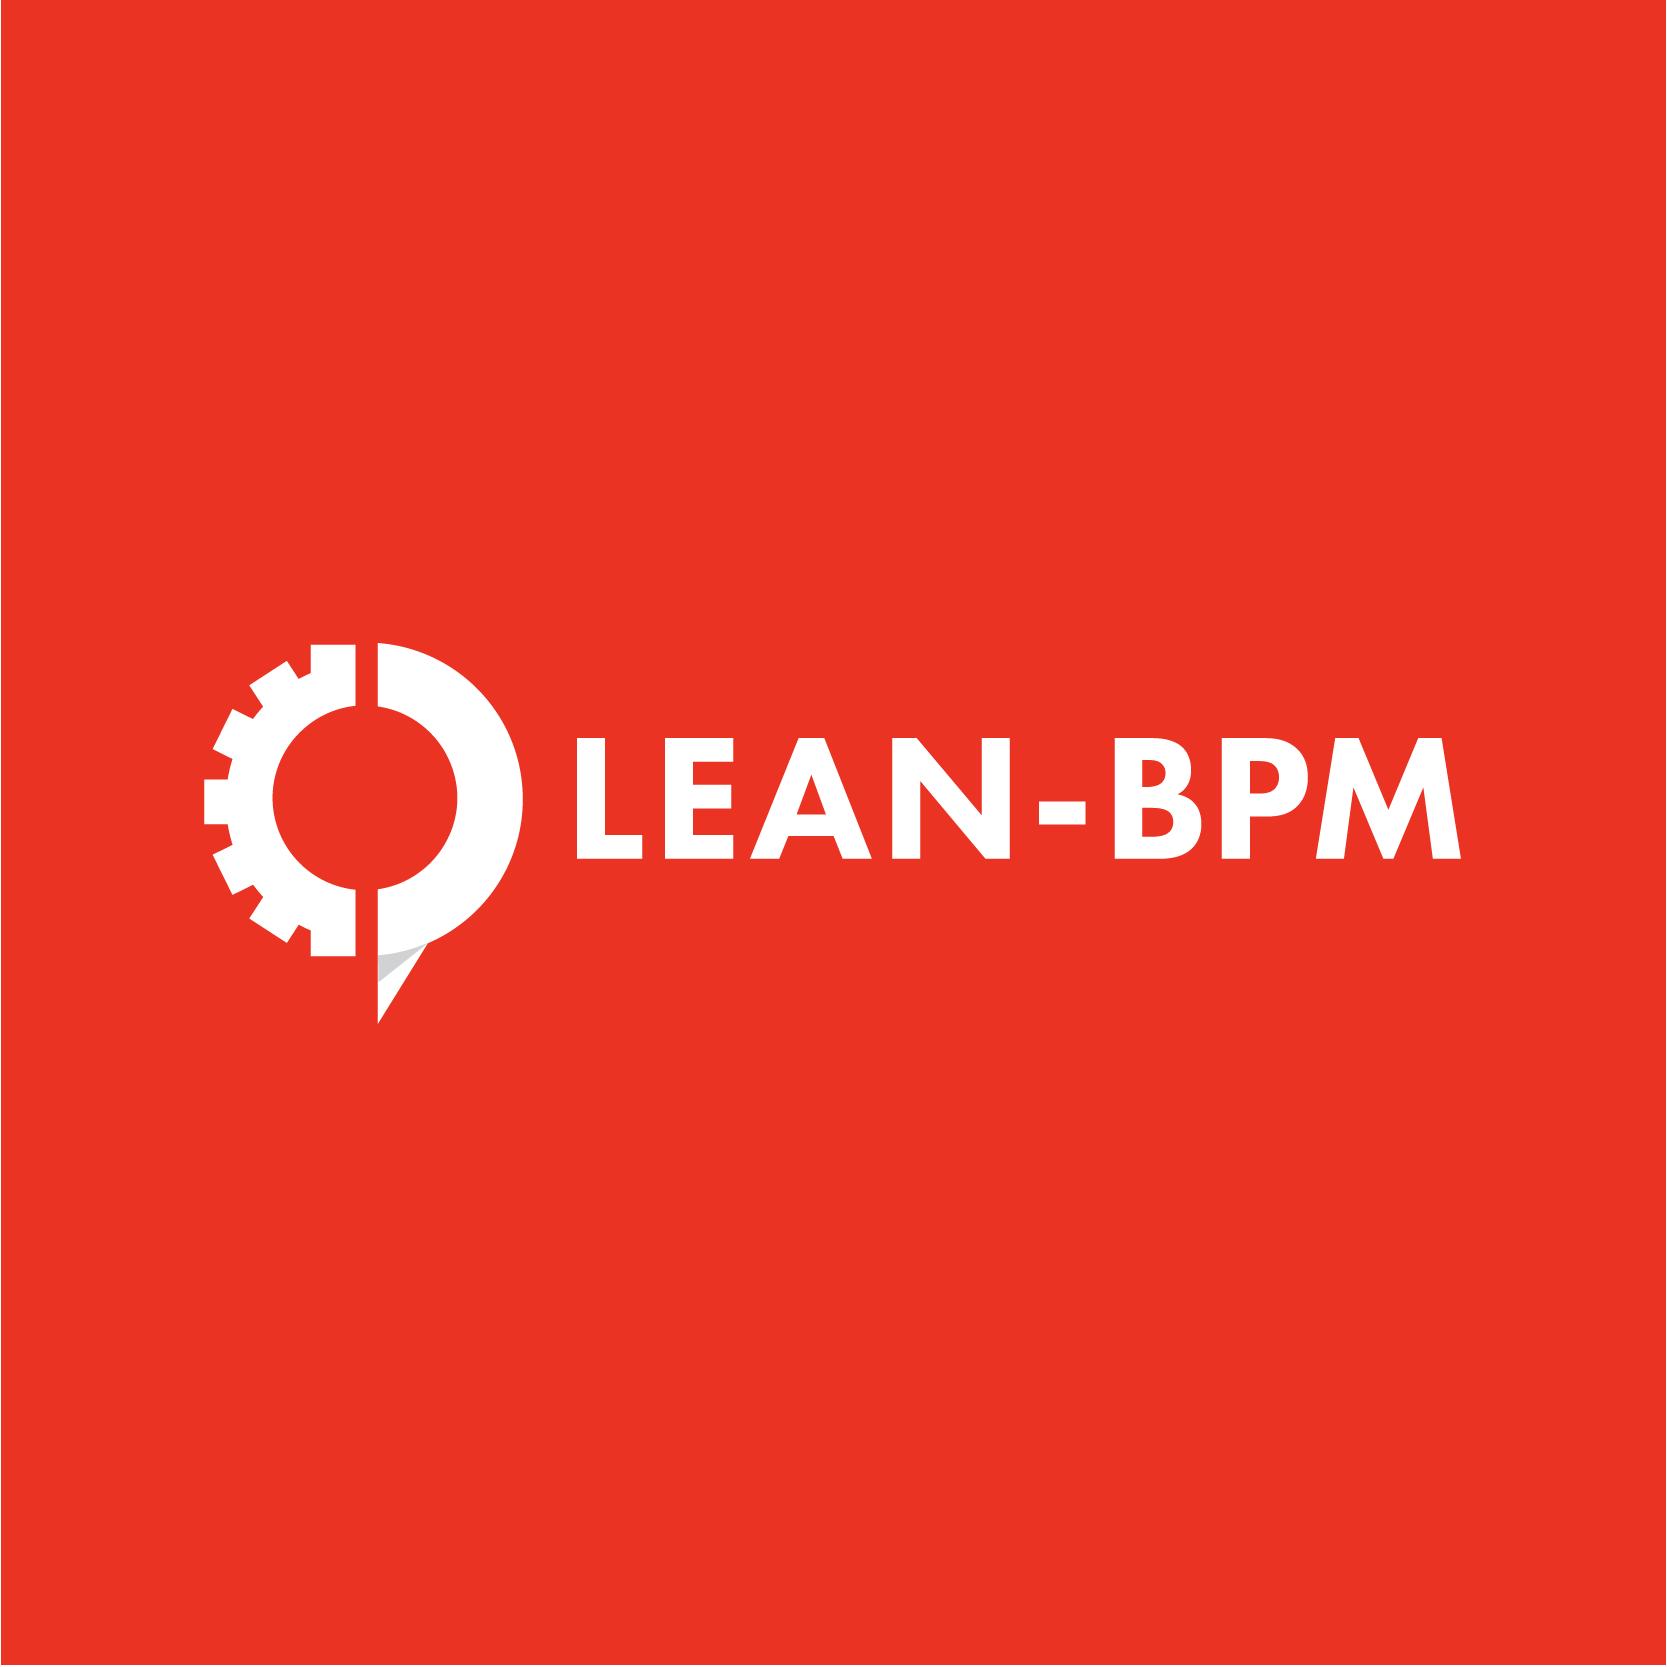 lean-bpm-columbus-branding-logo-horizontal.png